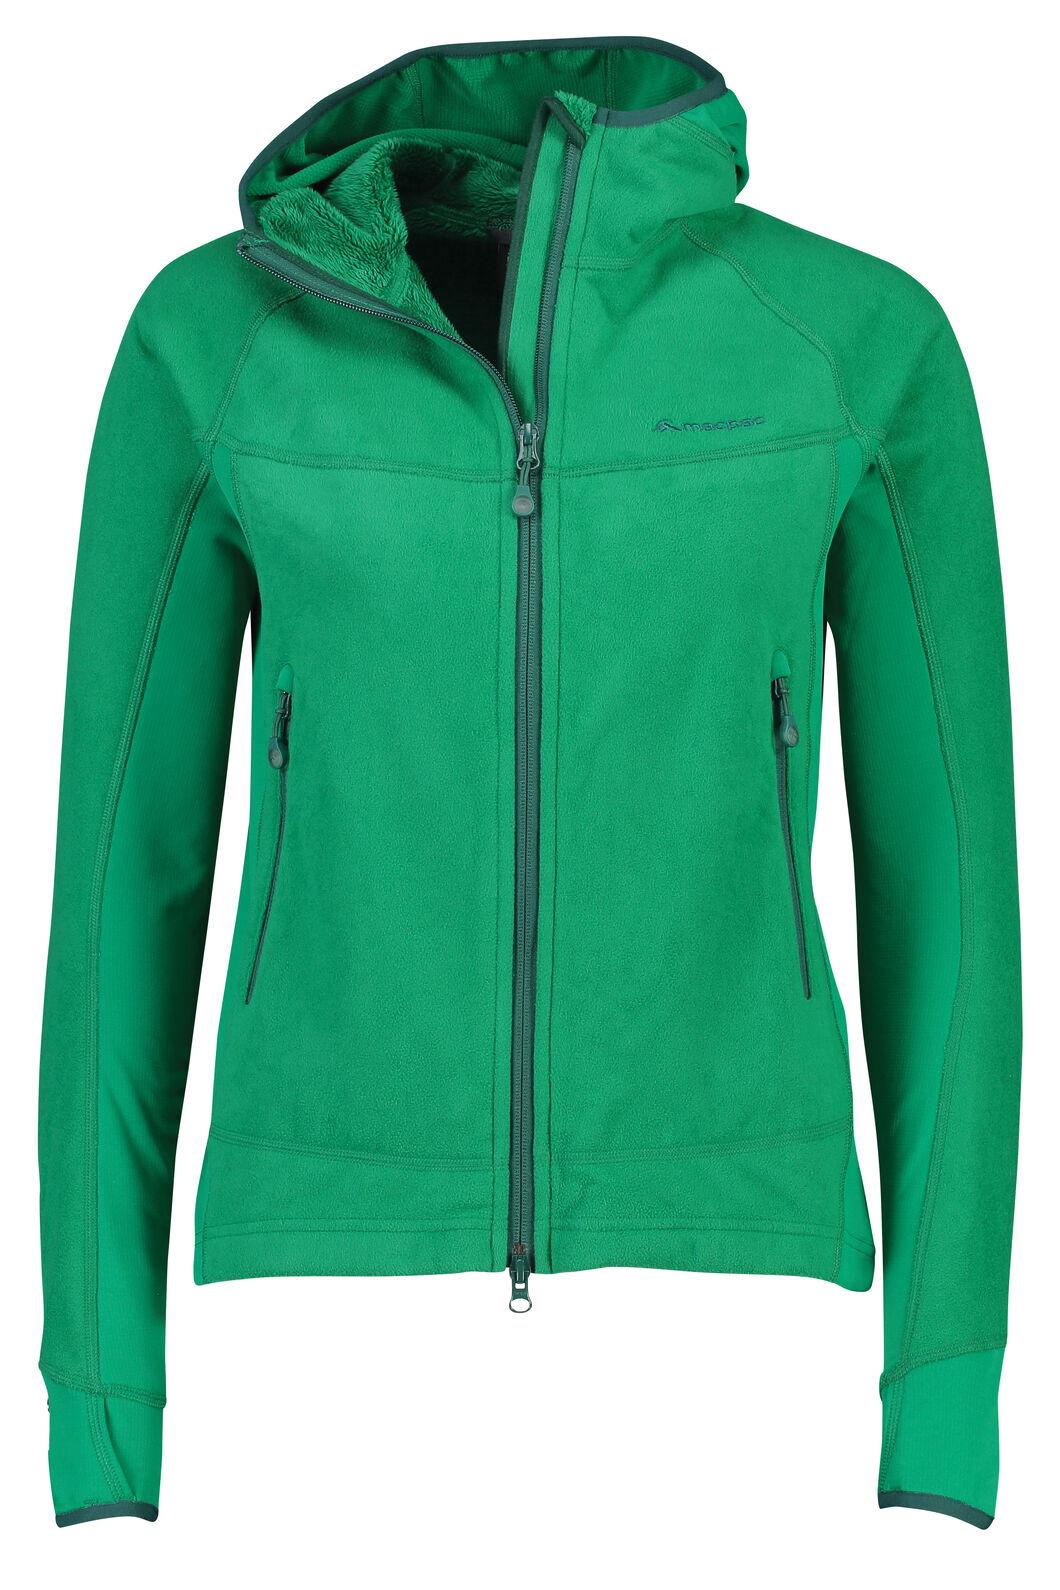 Mountain Hooded Pontetorto® Fleece Jacket - Women's, Ultramarine, hi-res